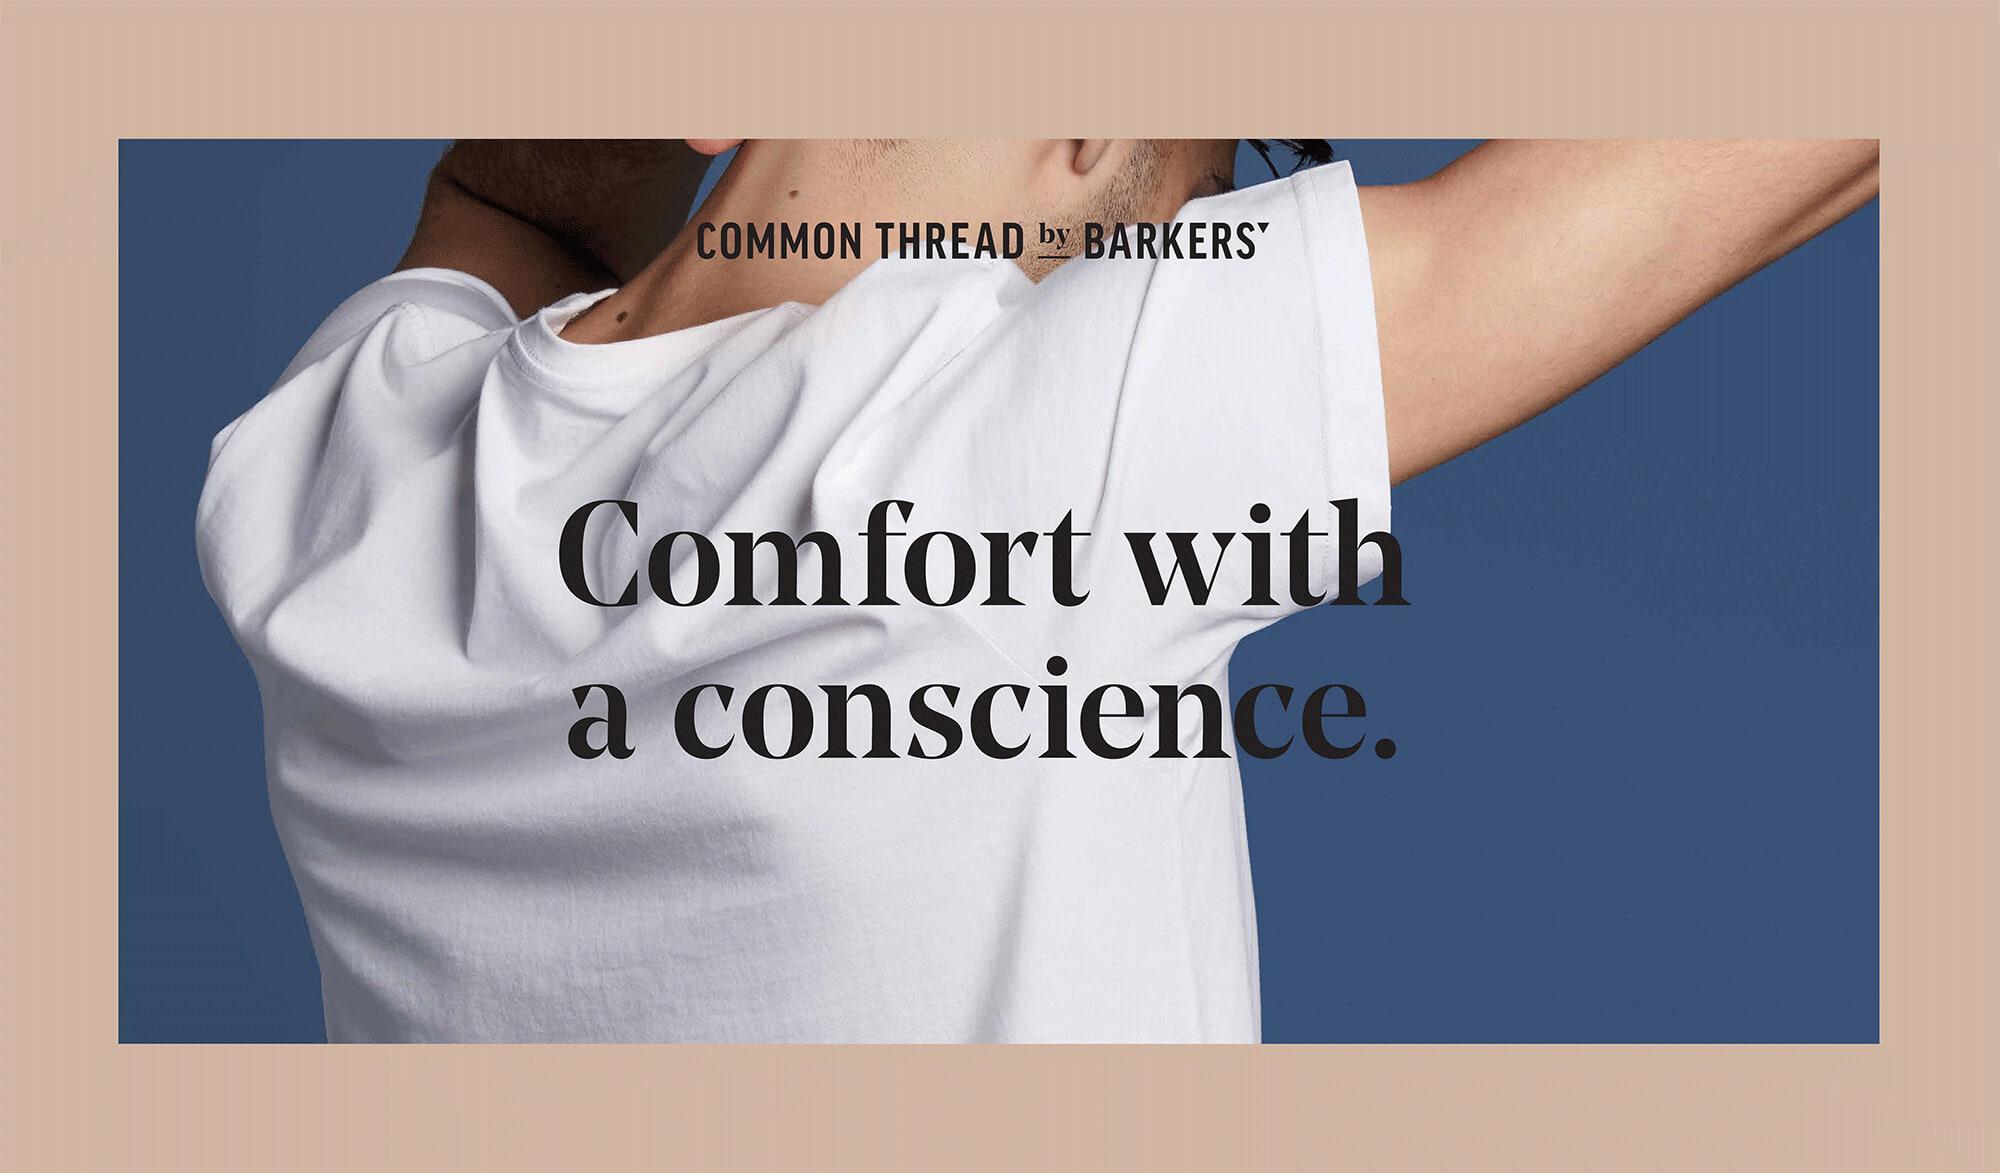 Barkers essentials range - Common Thread